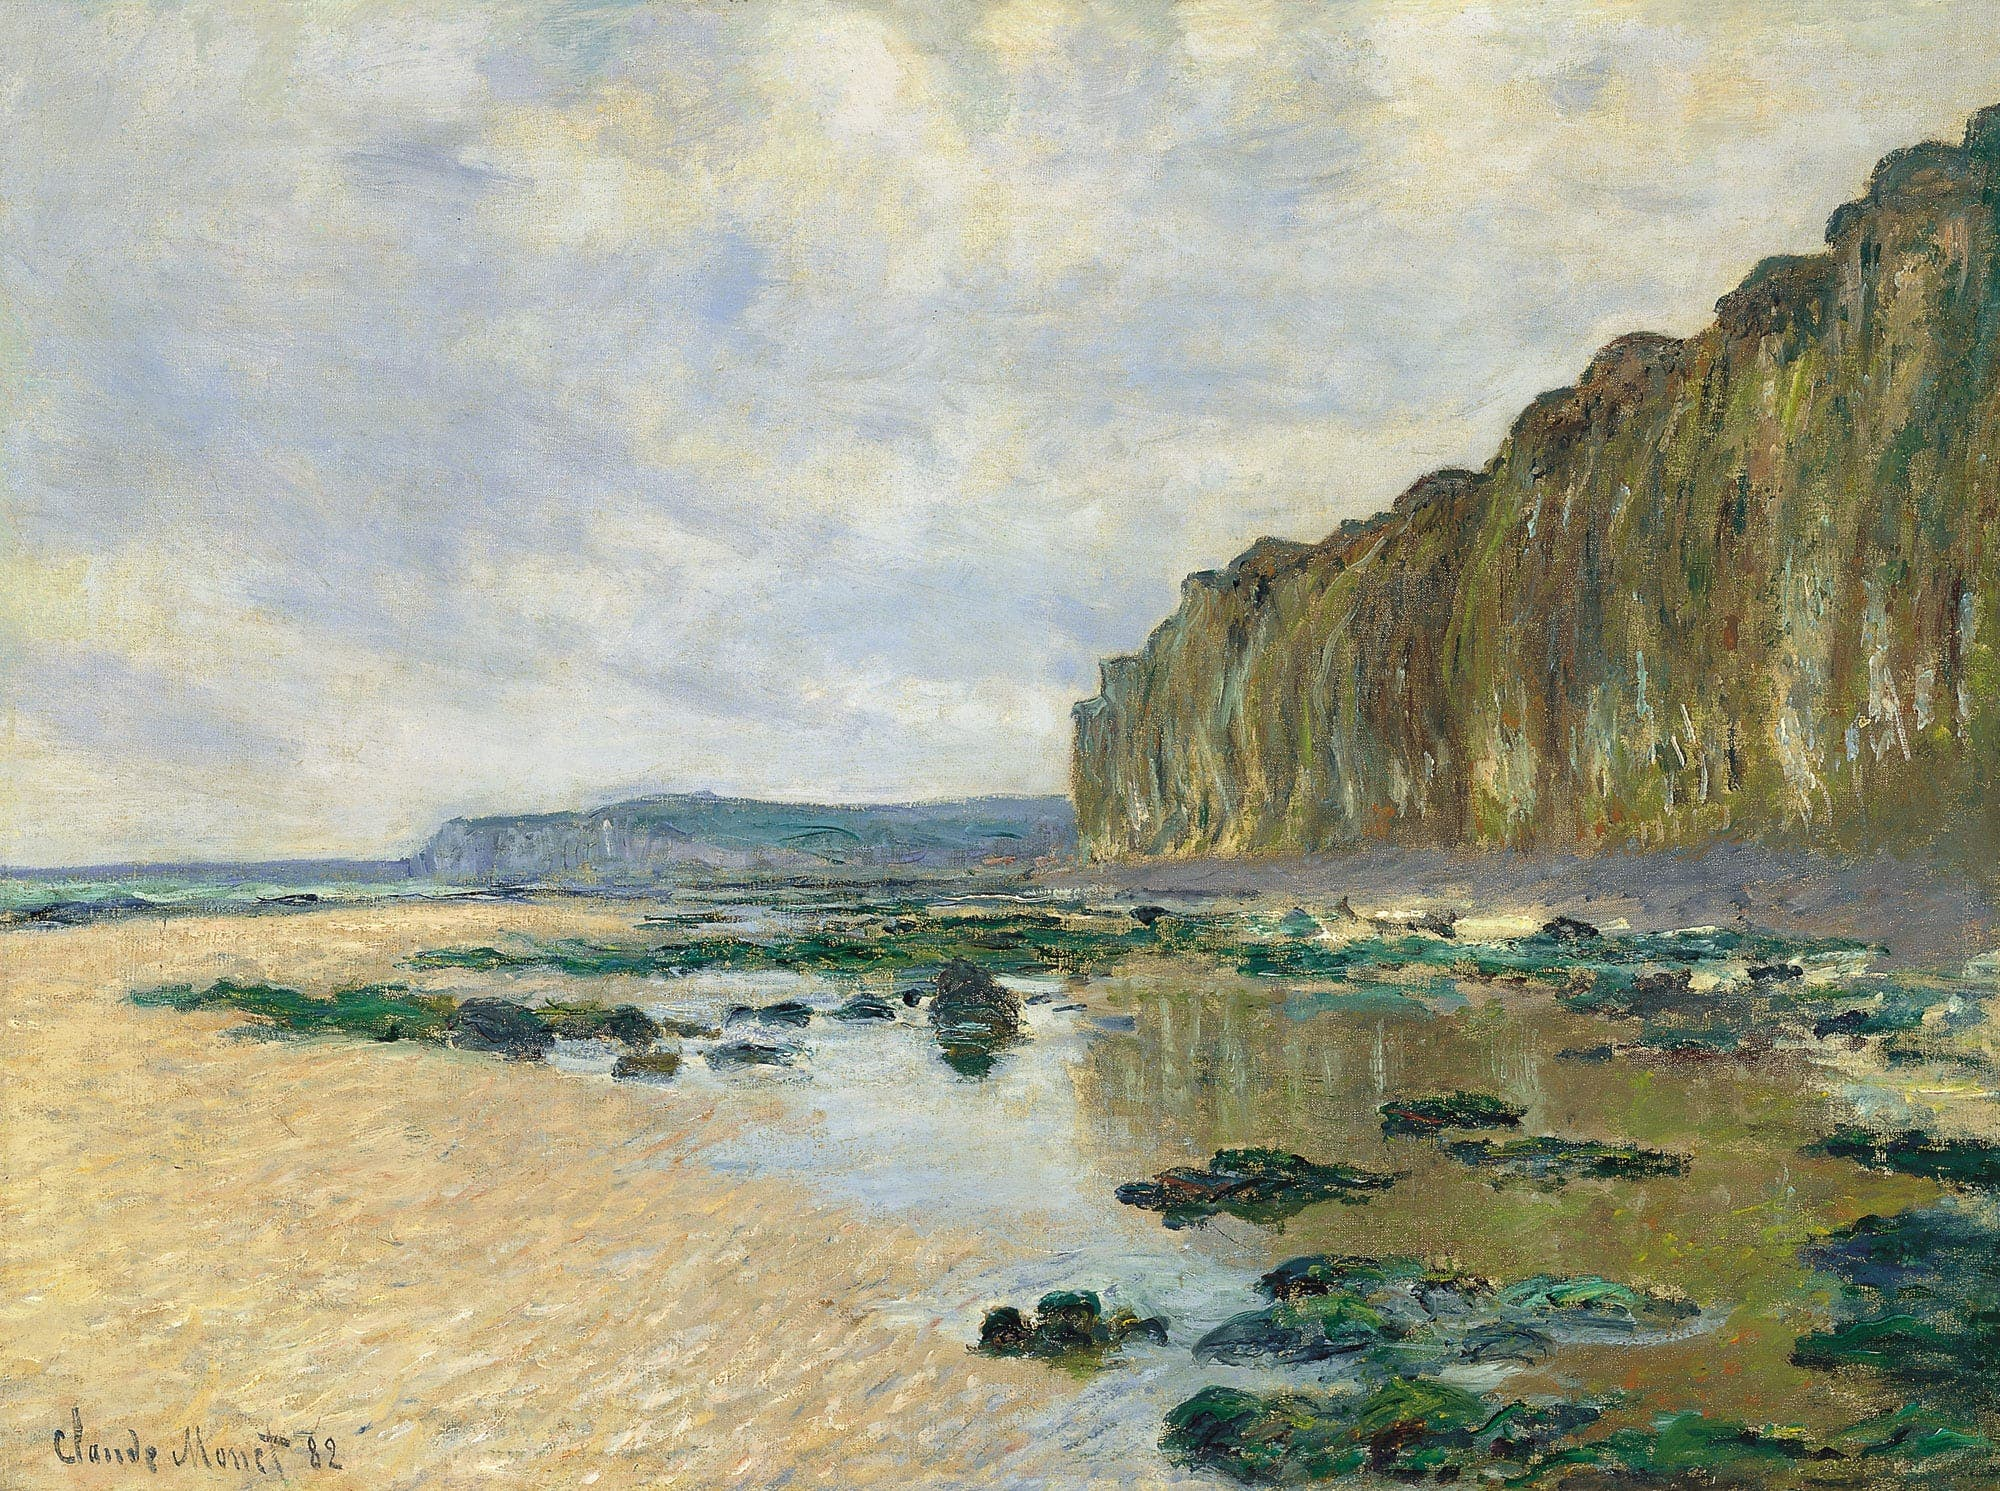 Van Gogh and Monet head to Malaga